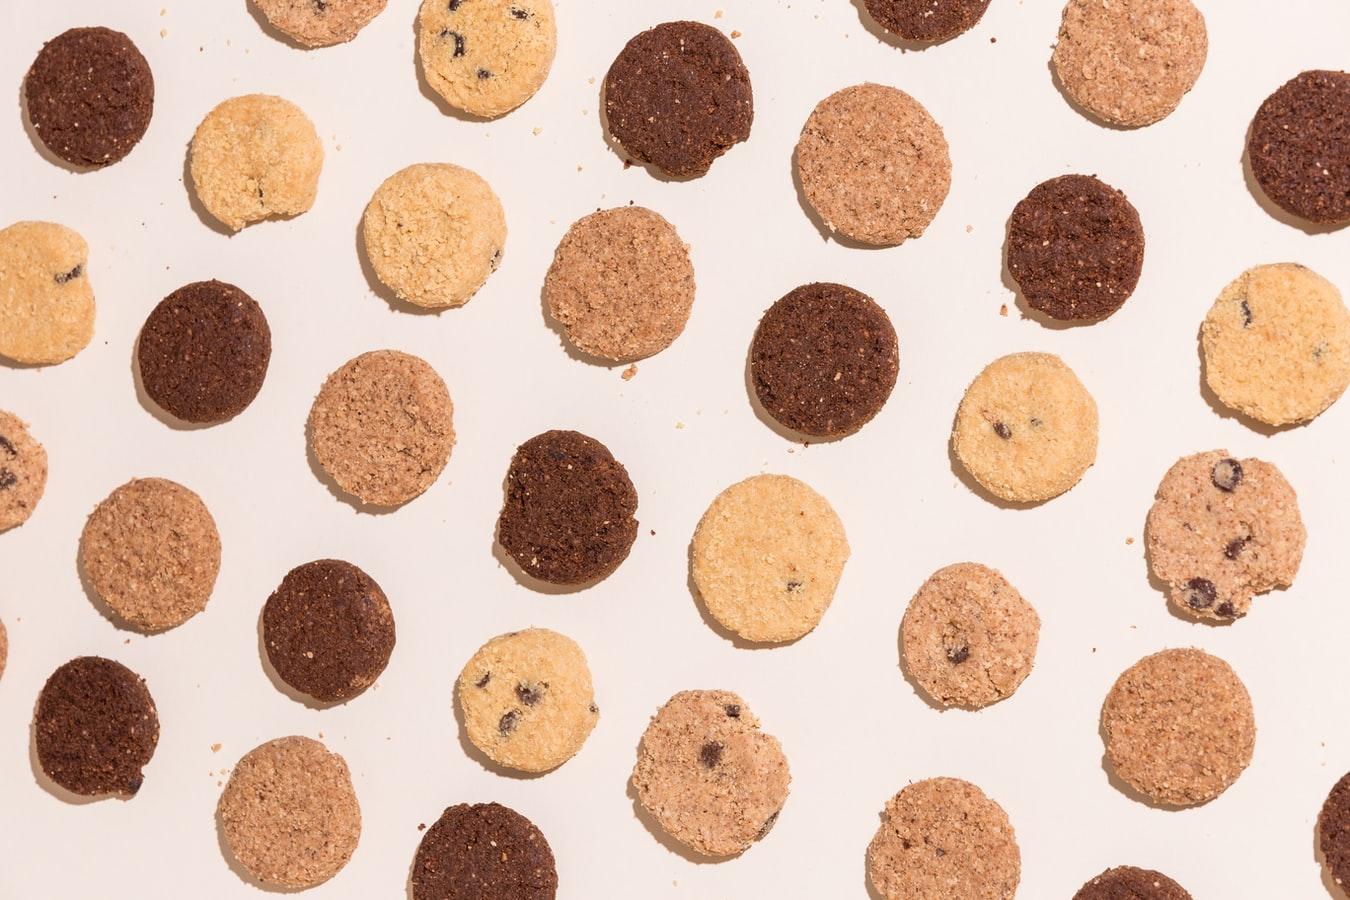 Cookie(クッキー)とは?意味やキャッシュとの違い、削除方法